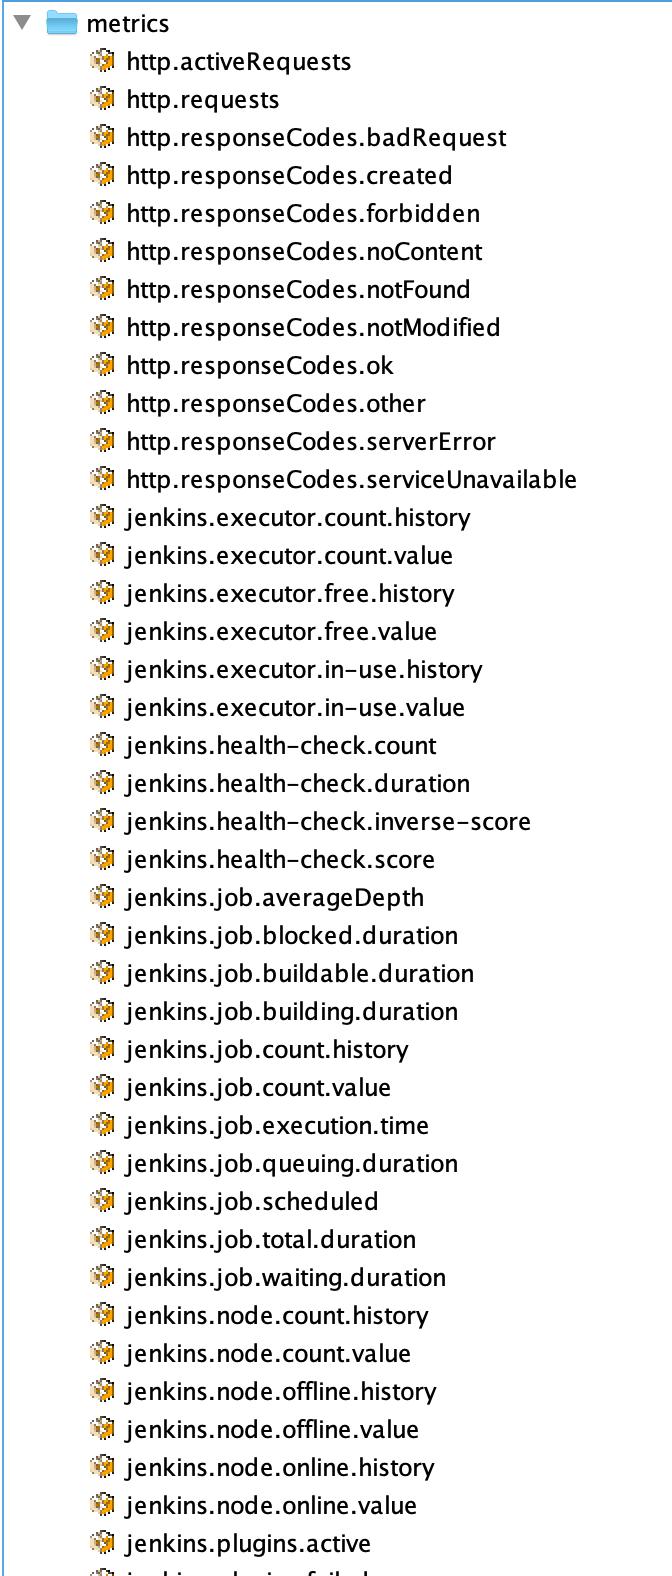 JENKINS-58169] JMX: Use hierarchical names - Jenkins JIRA